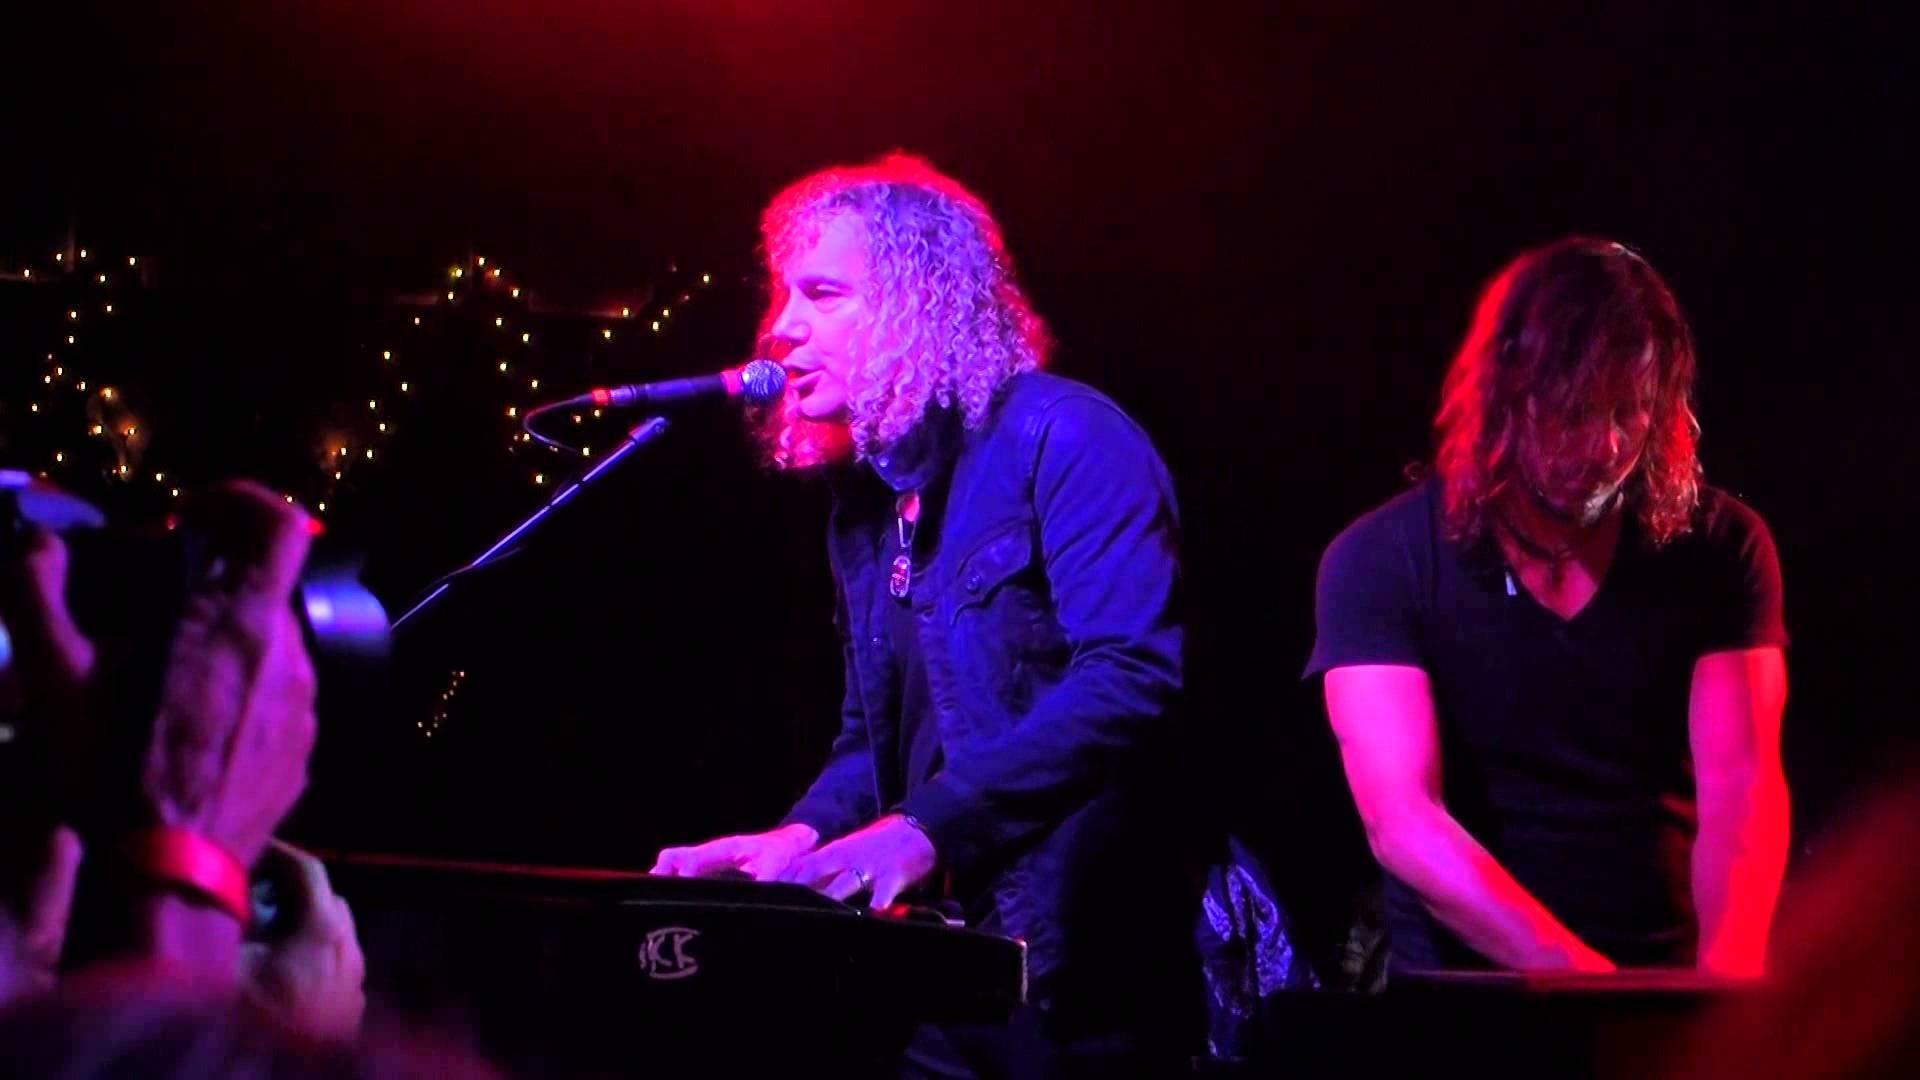 bon jovi keyboardist david bryan joins matt oree on stage